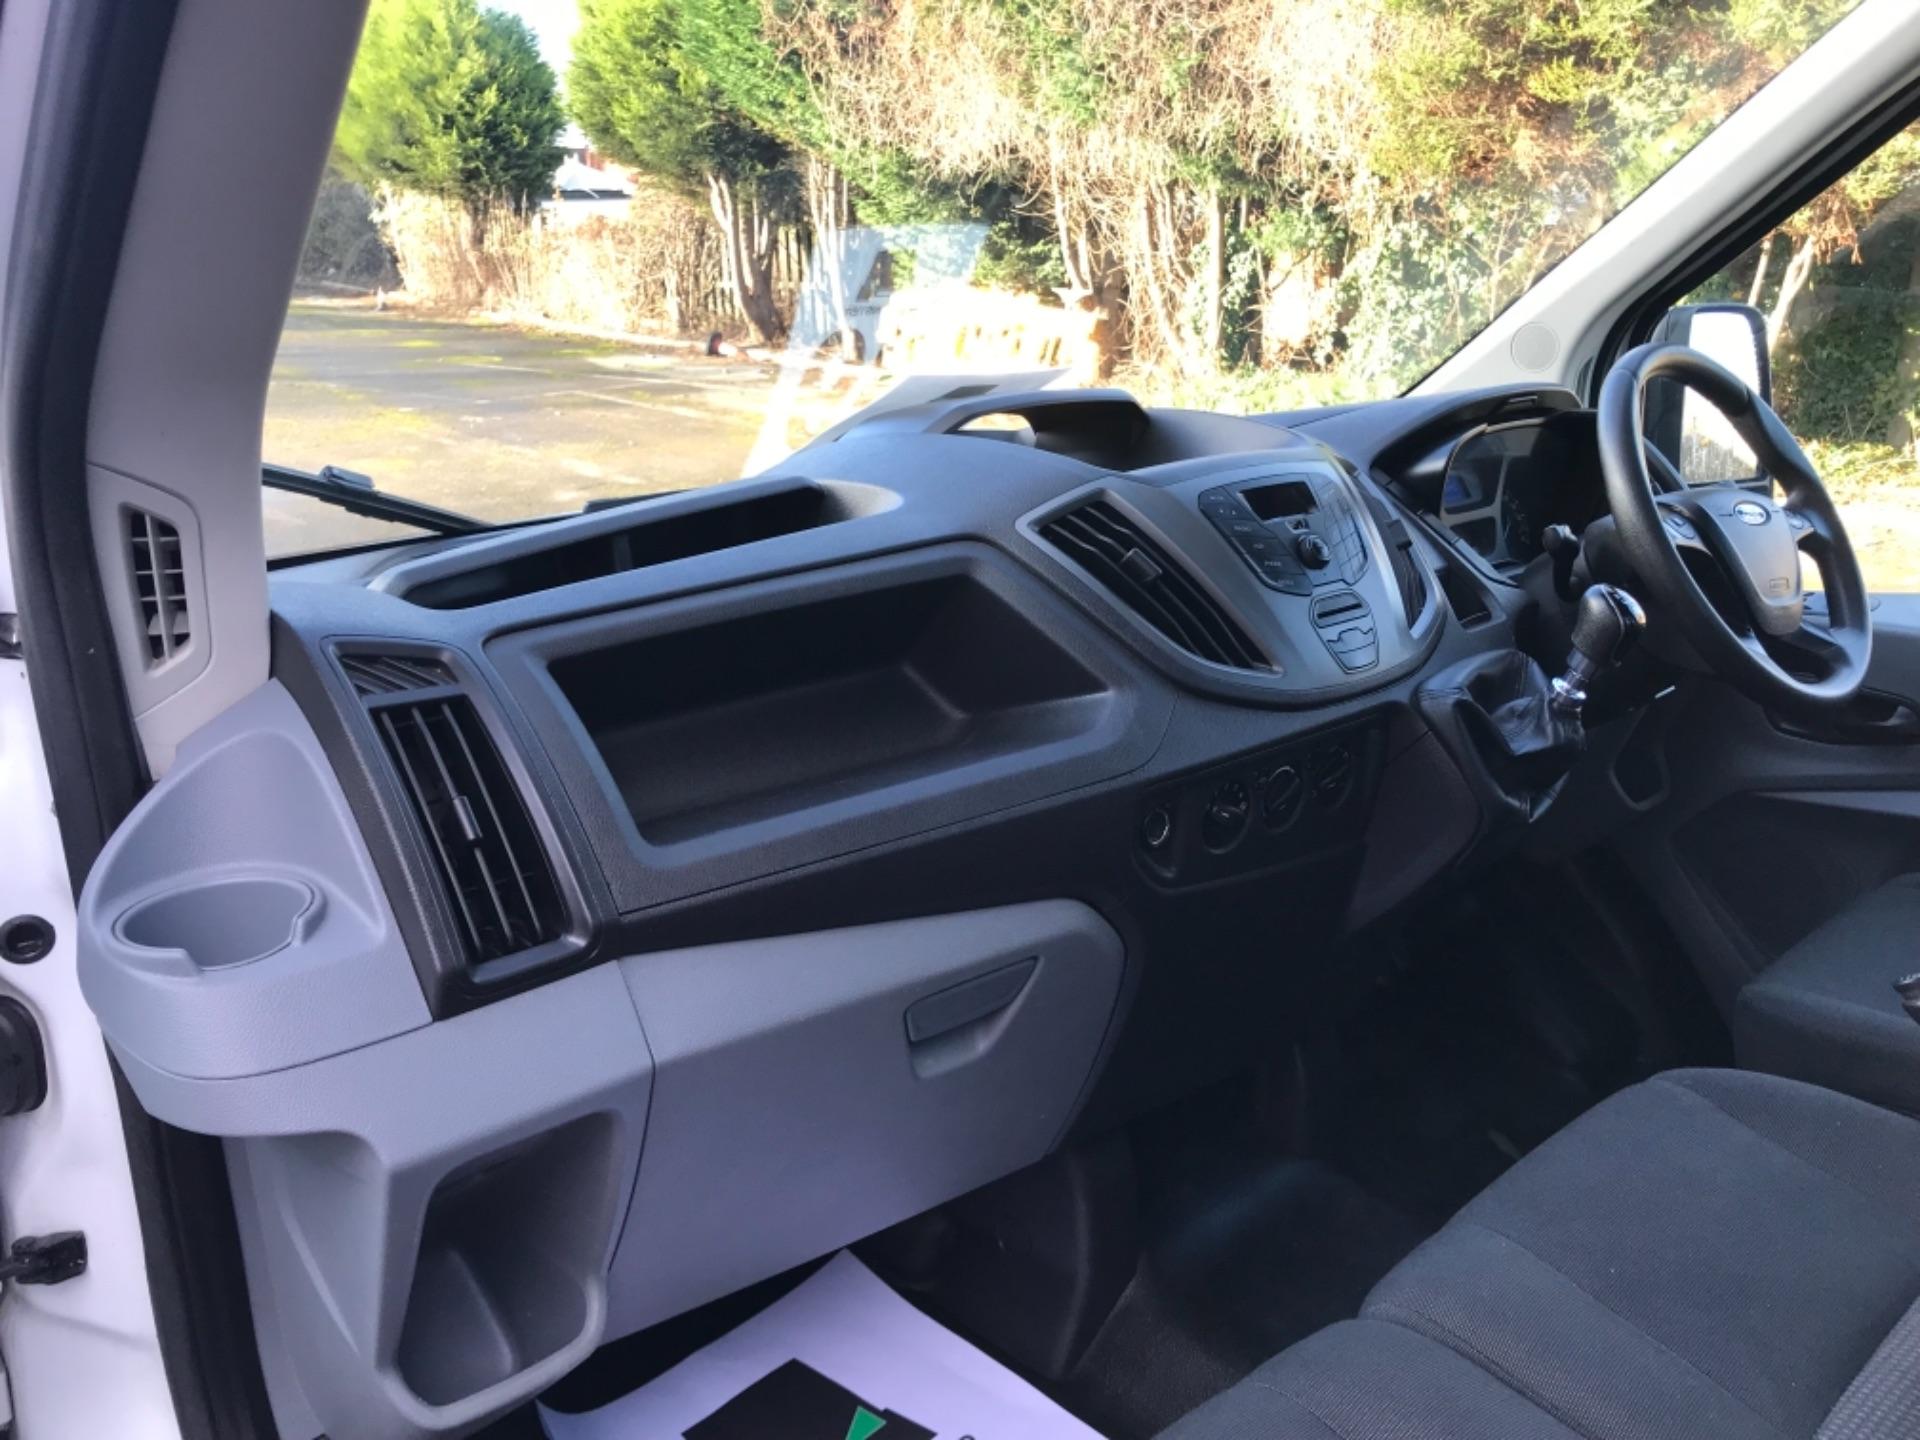 2016 Ford Transit 2.2 Tdci 125Ps Dropside DRW Tail lift (YS66SNU) Image 22